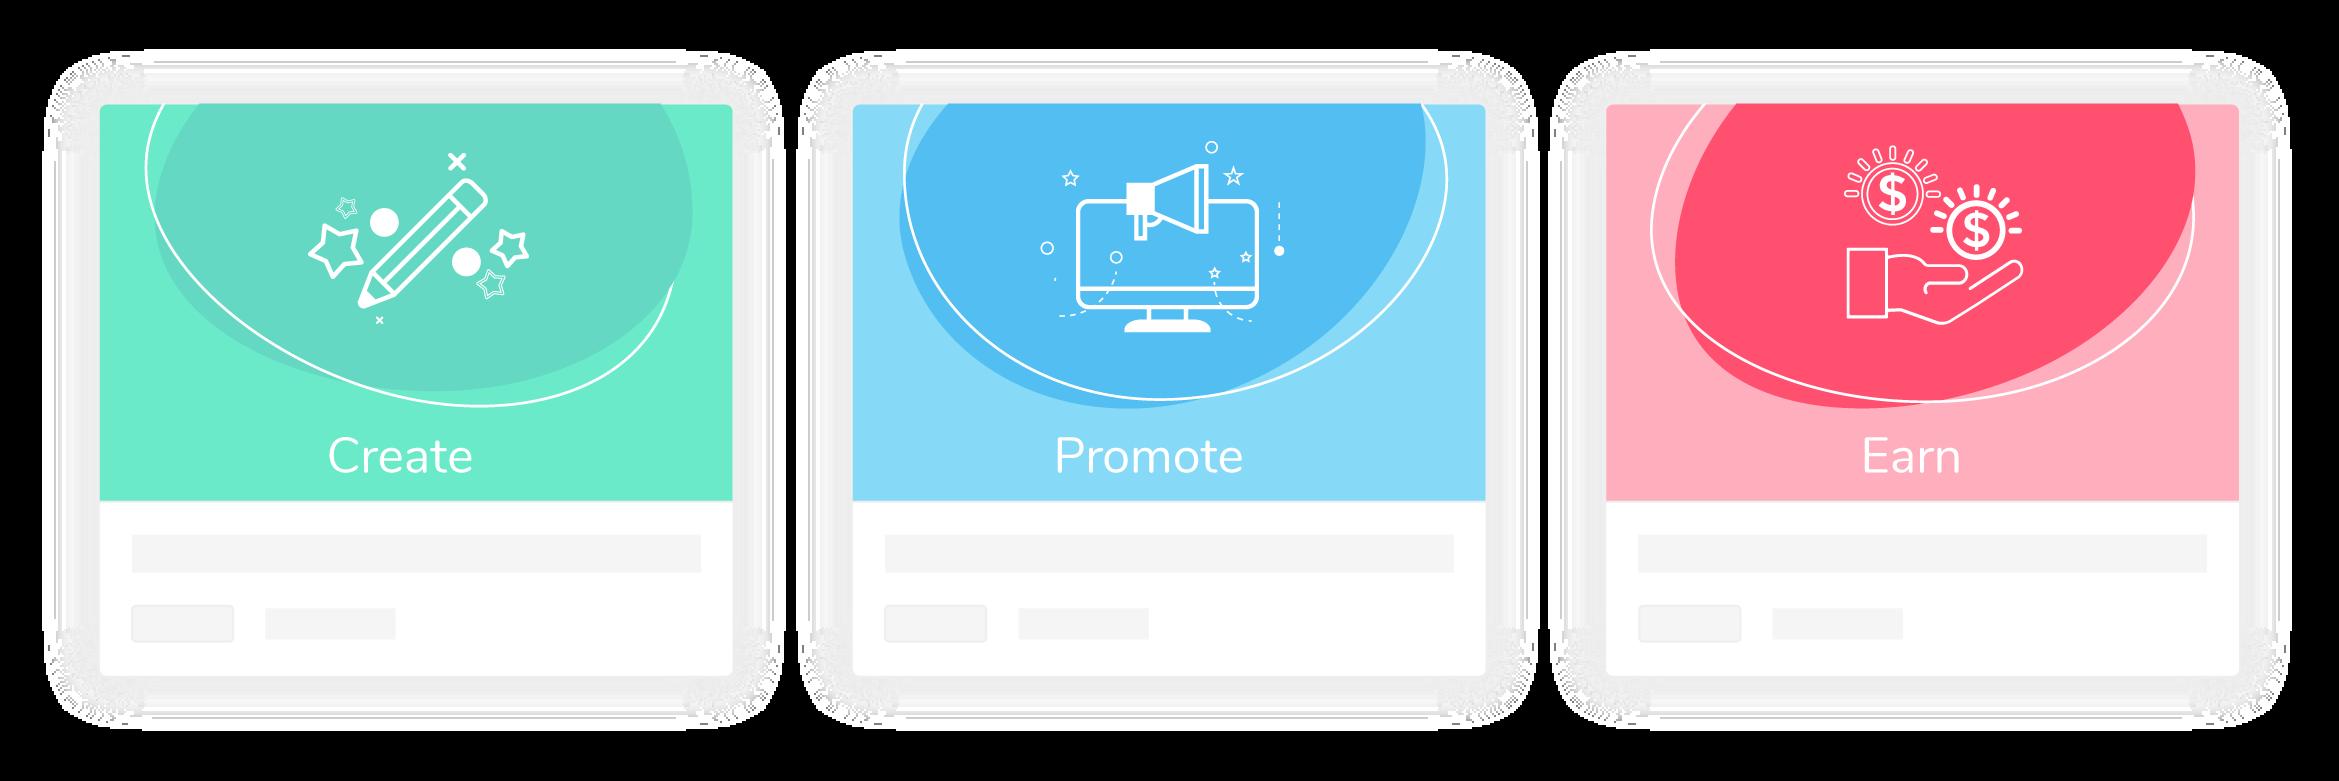 Create, Promote, Earn